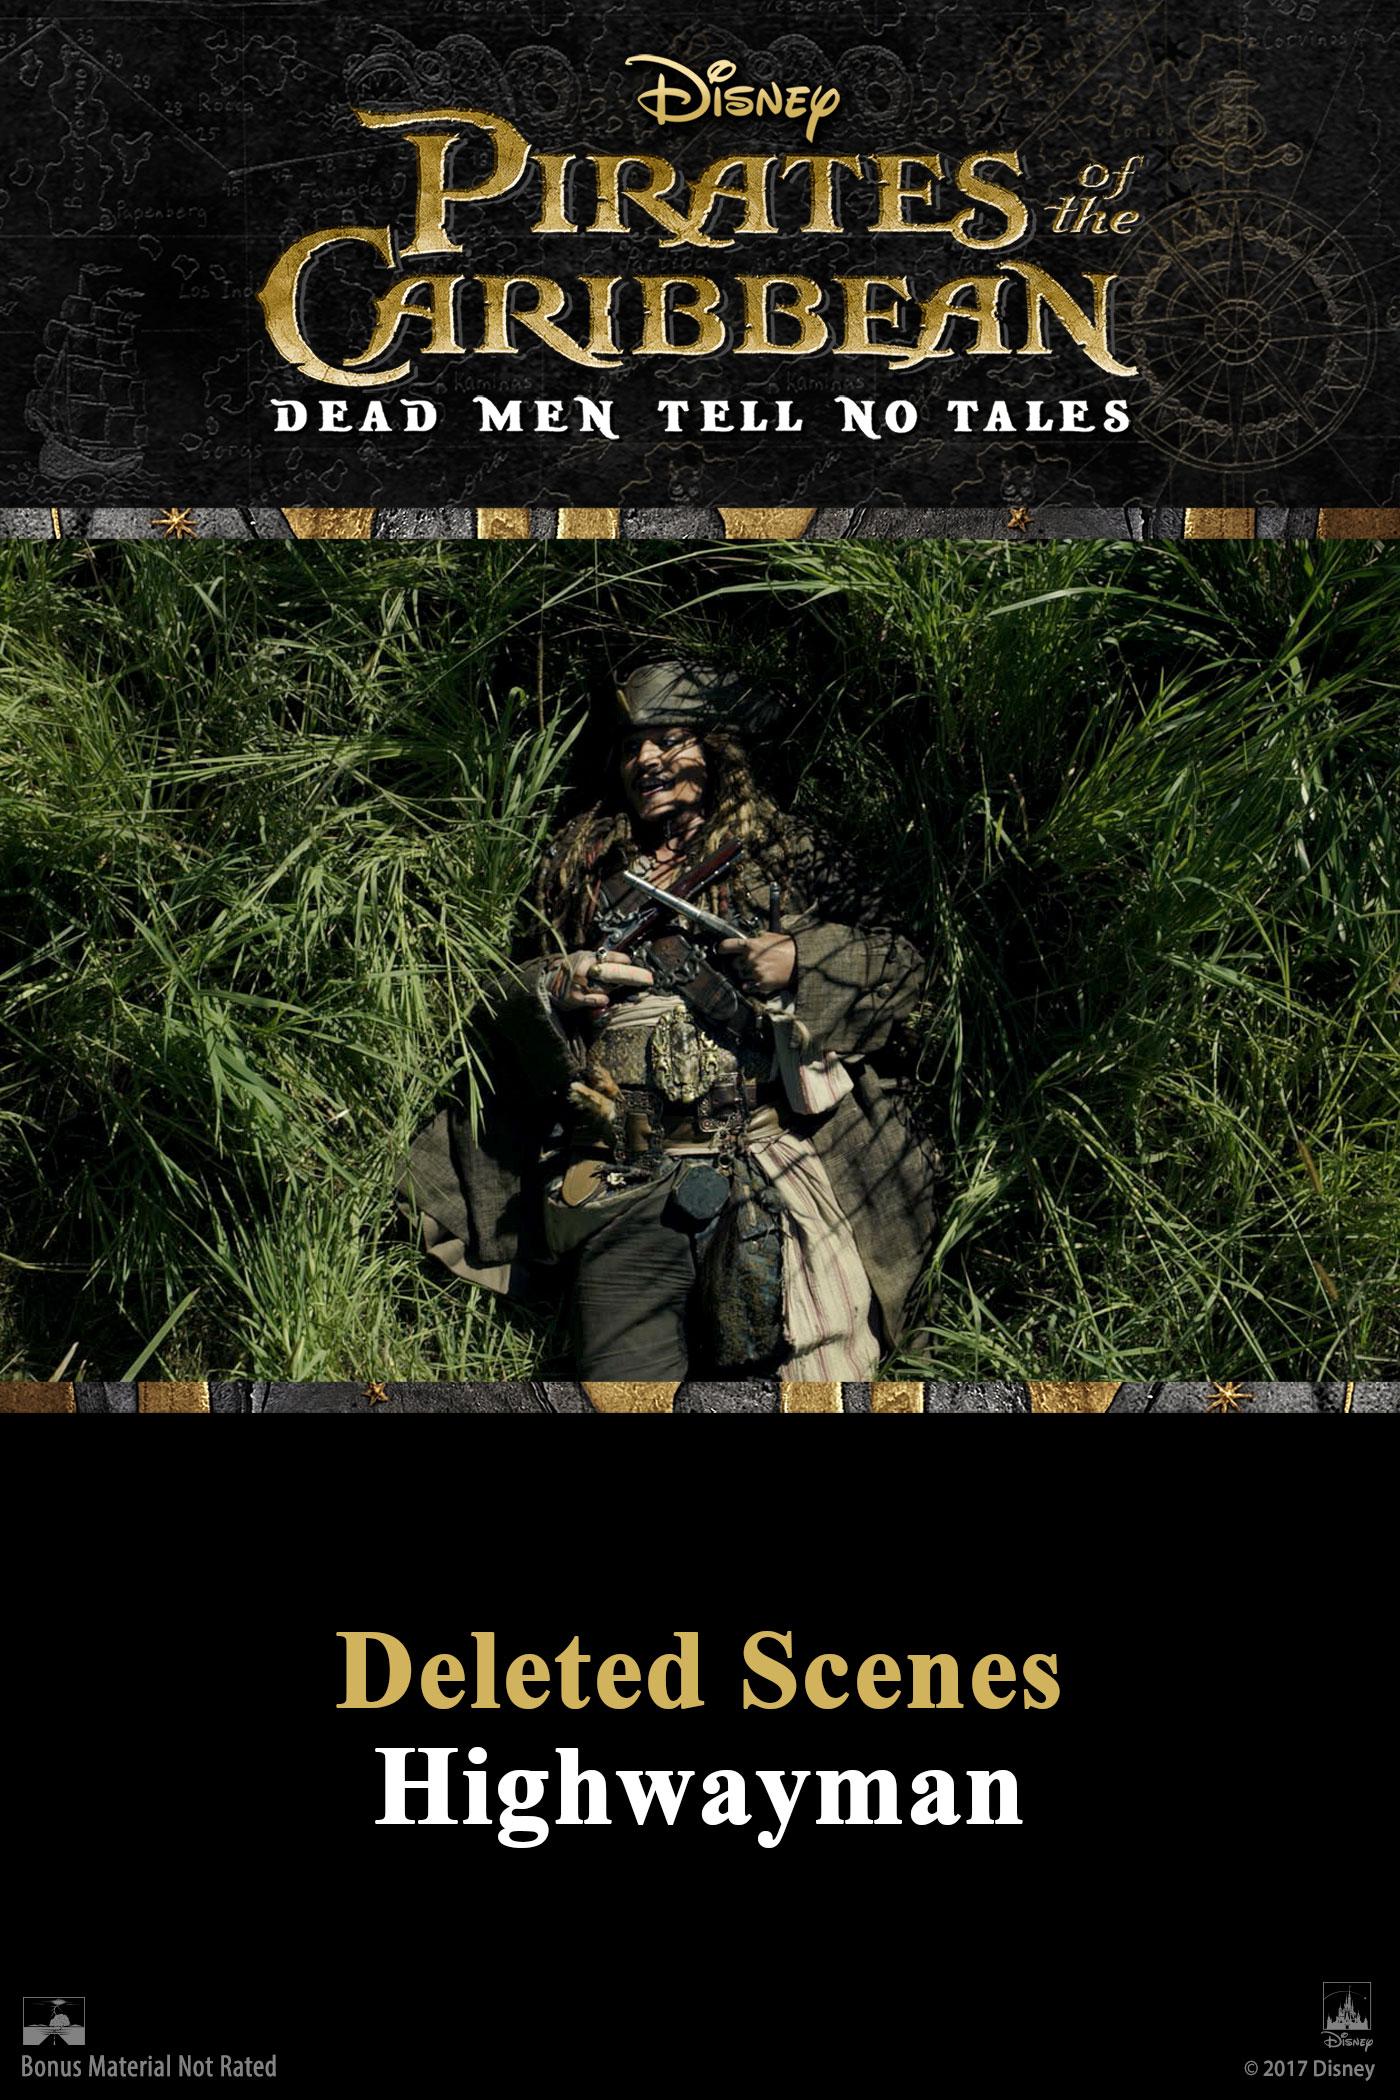 Deleted Scene - Highwayman